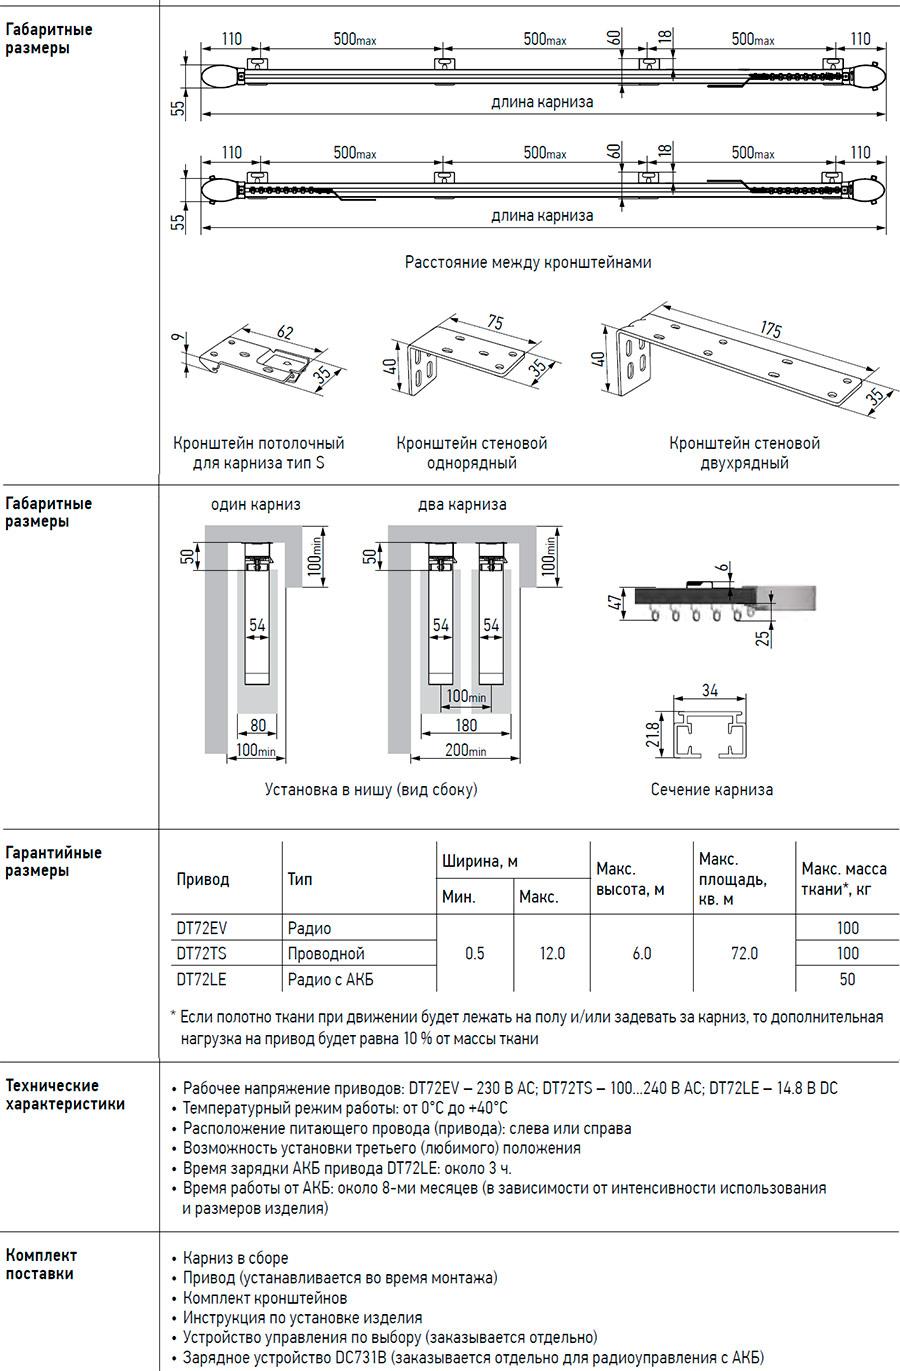 Характеристики моторизированных штор